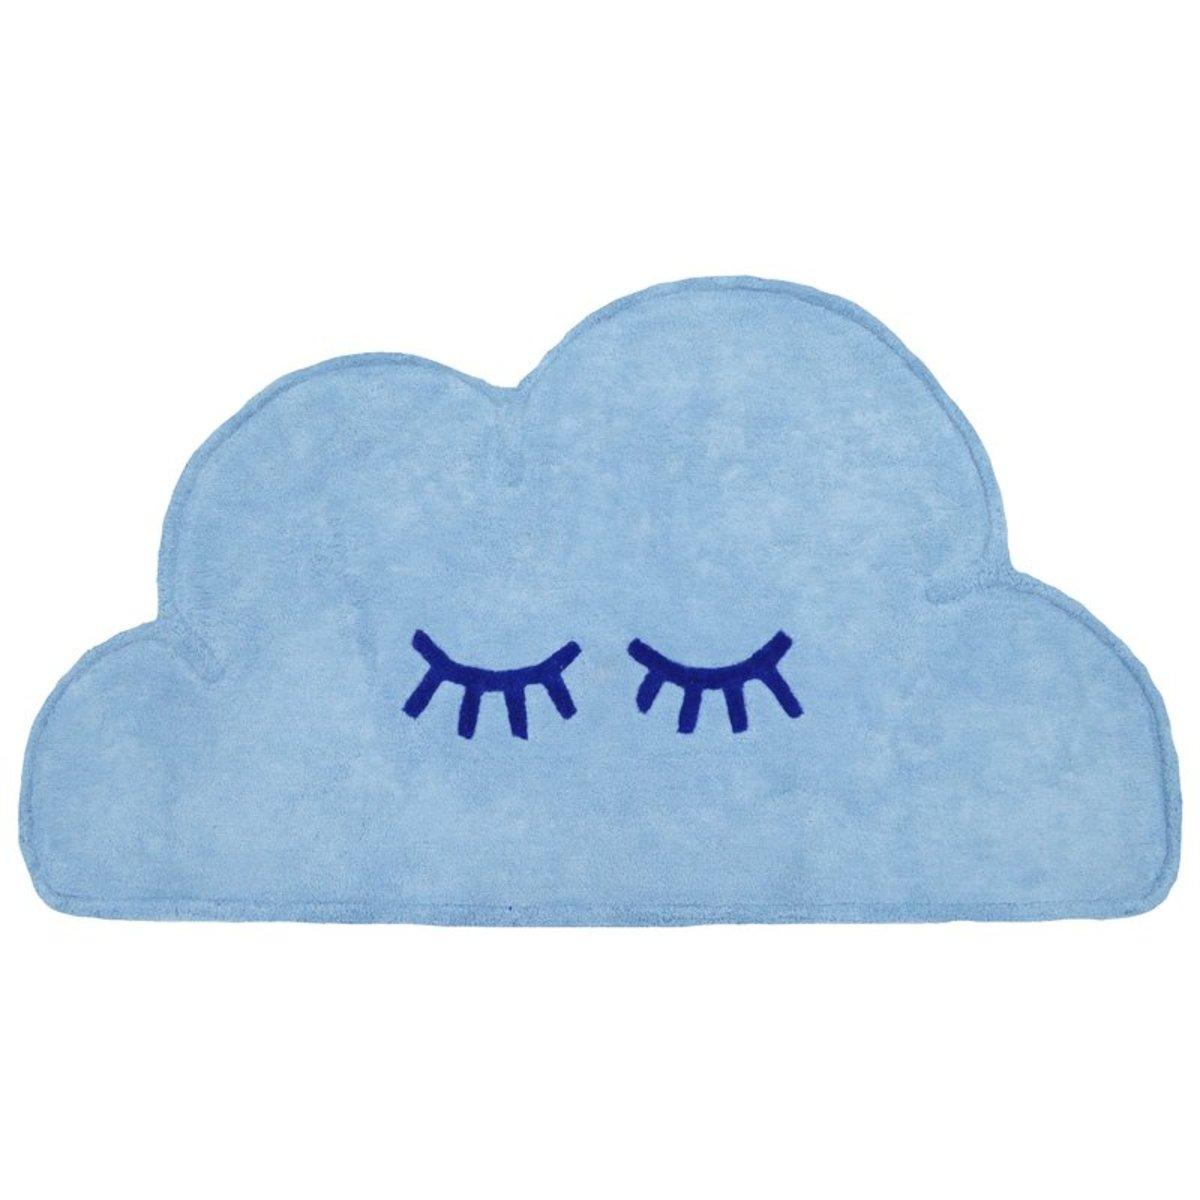 Detský koberec Mráčik - modrý Cloud 60x110 cm